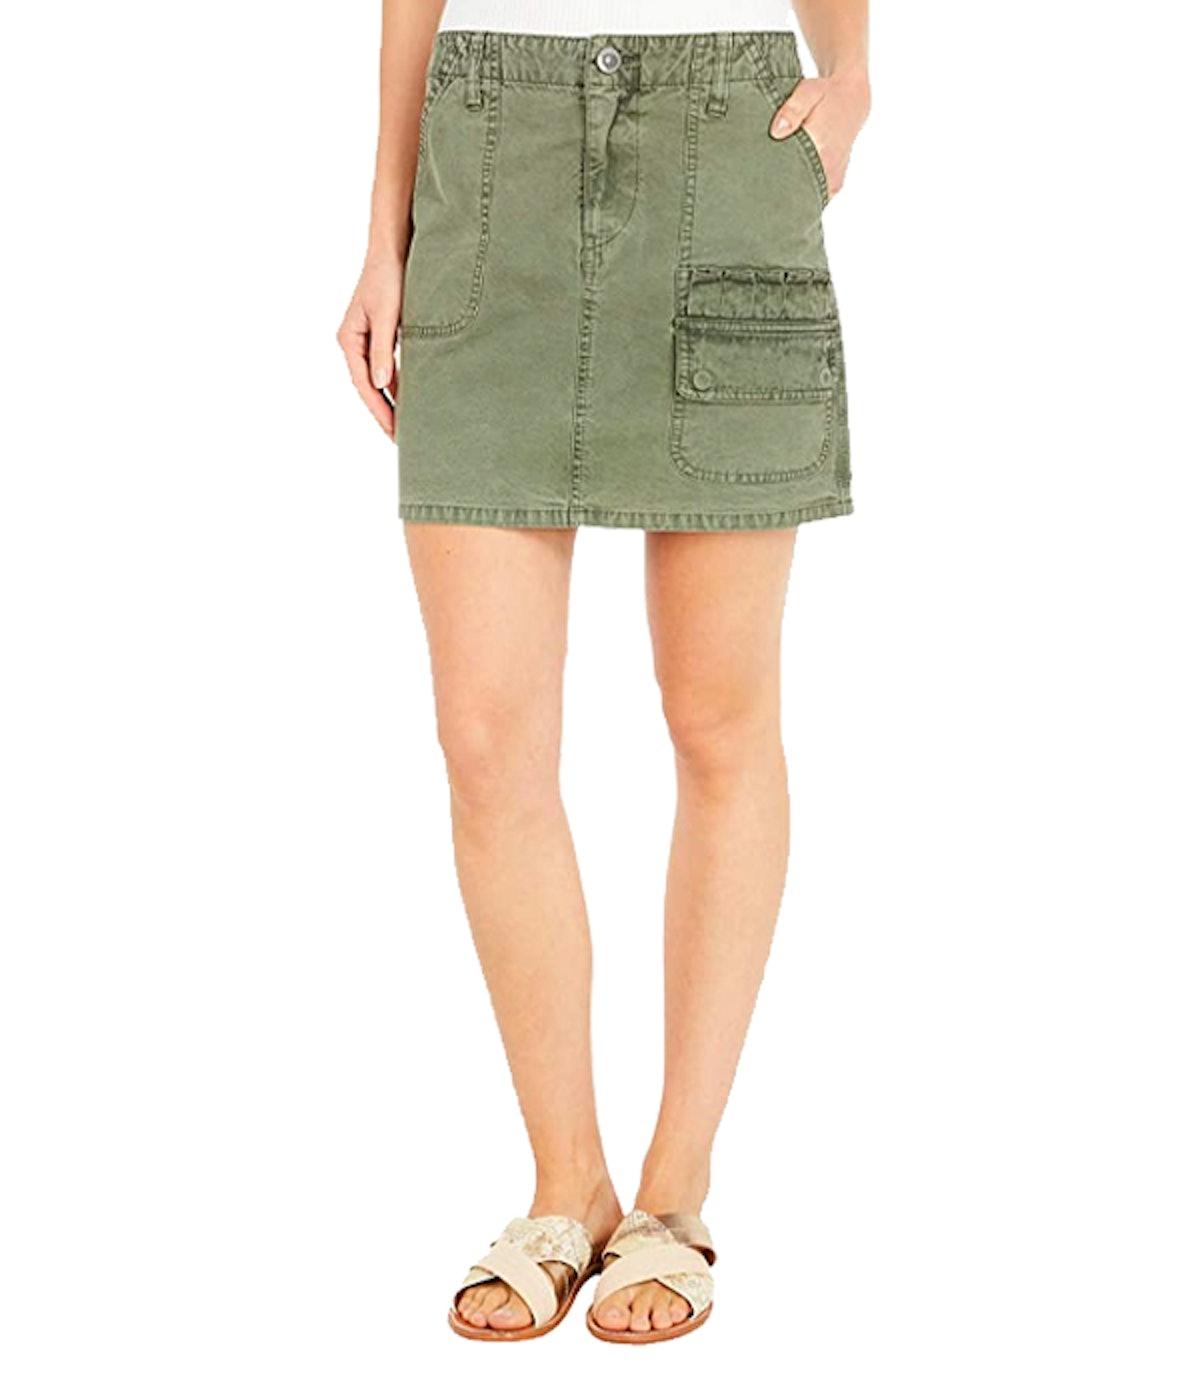 Hunter Mini Skirt in Military Olive